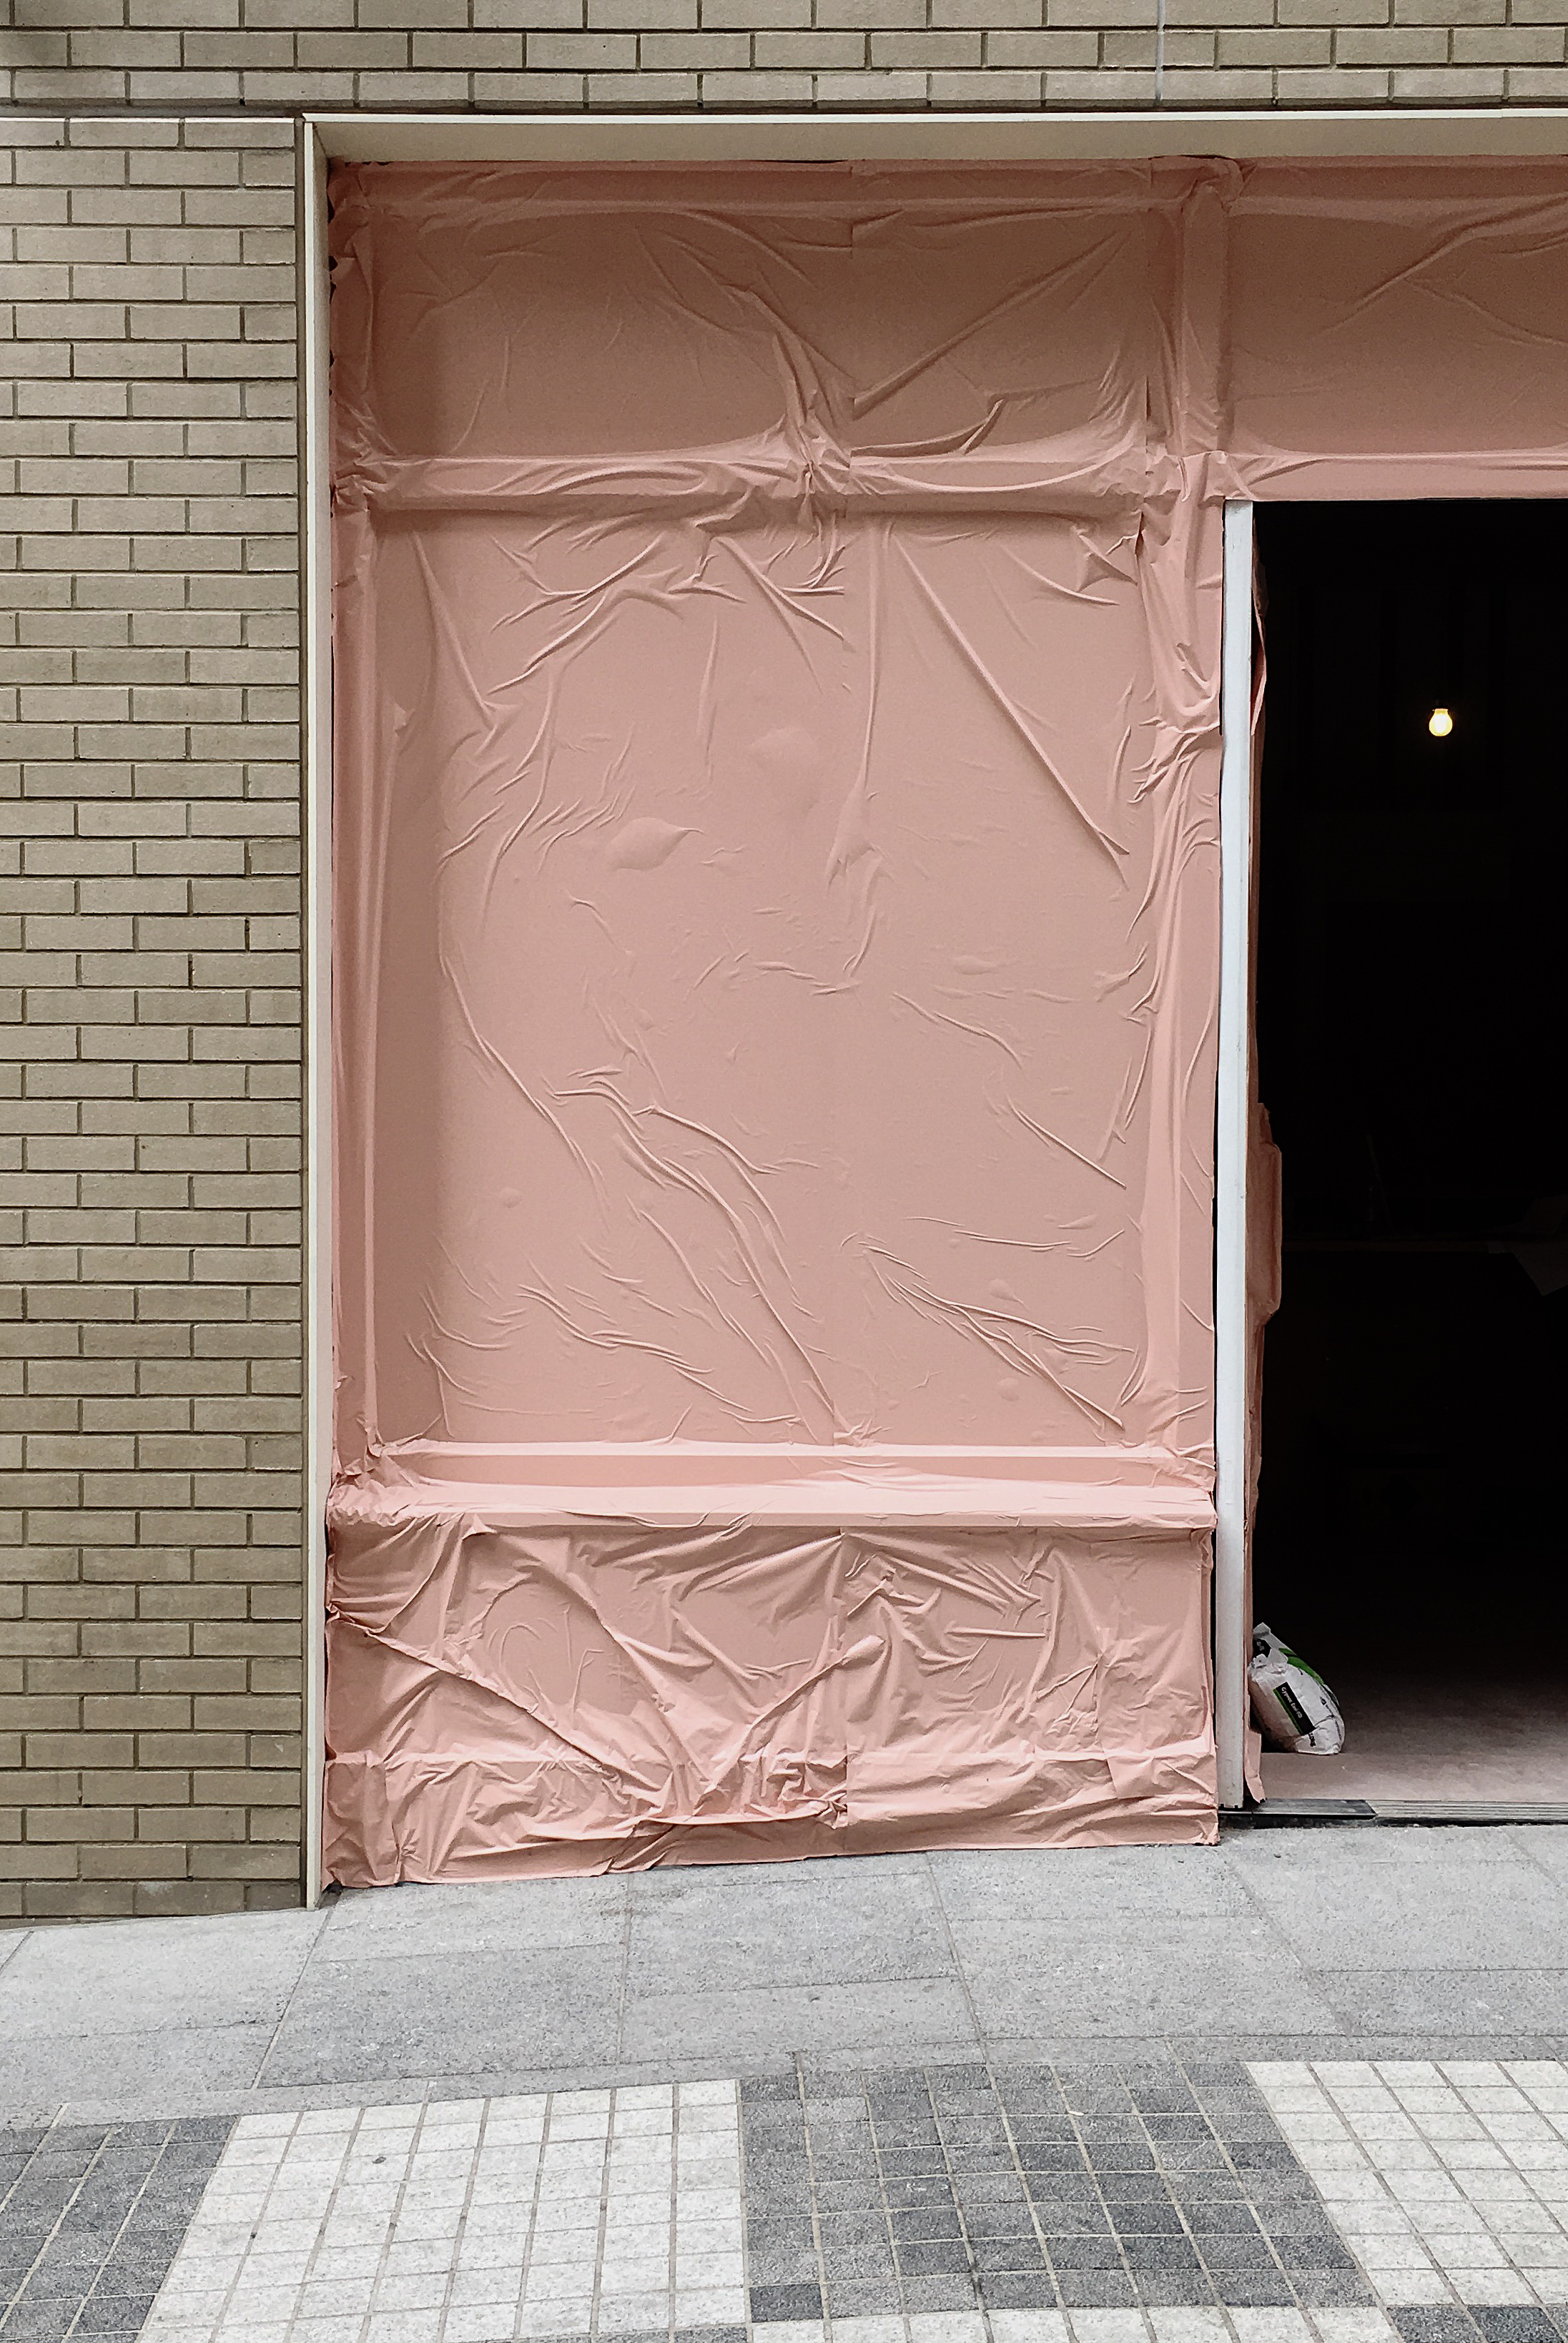 Super Ordinary Life Pink Wrap 2.jpg